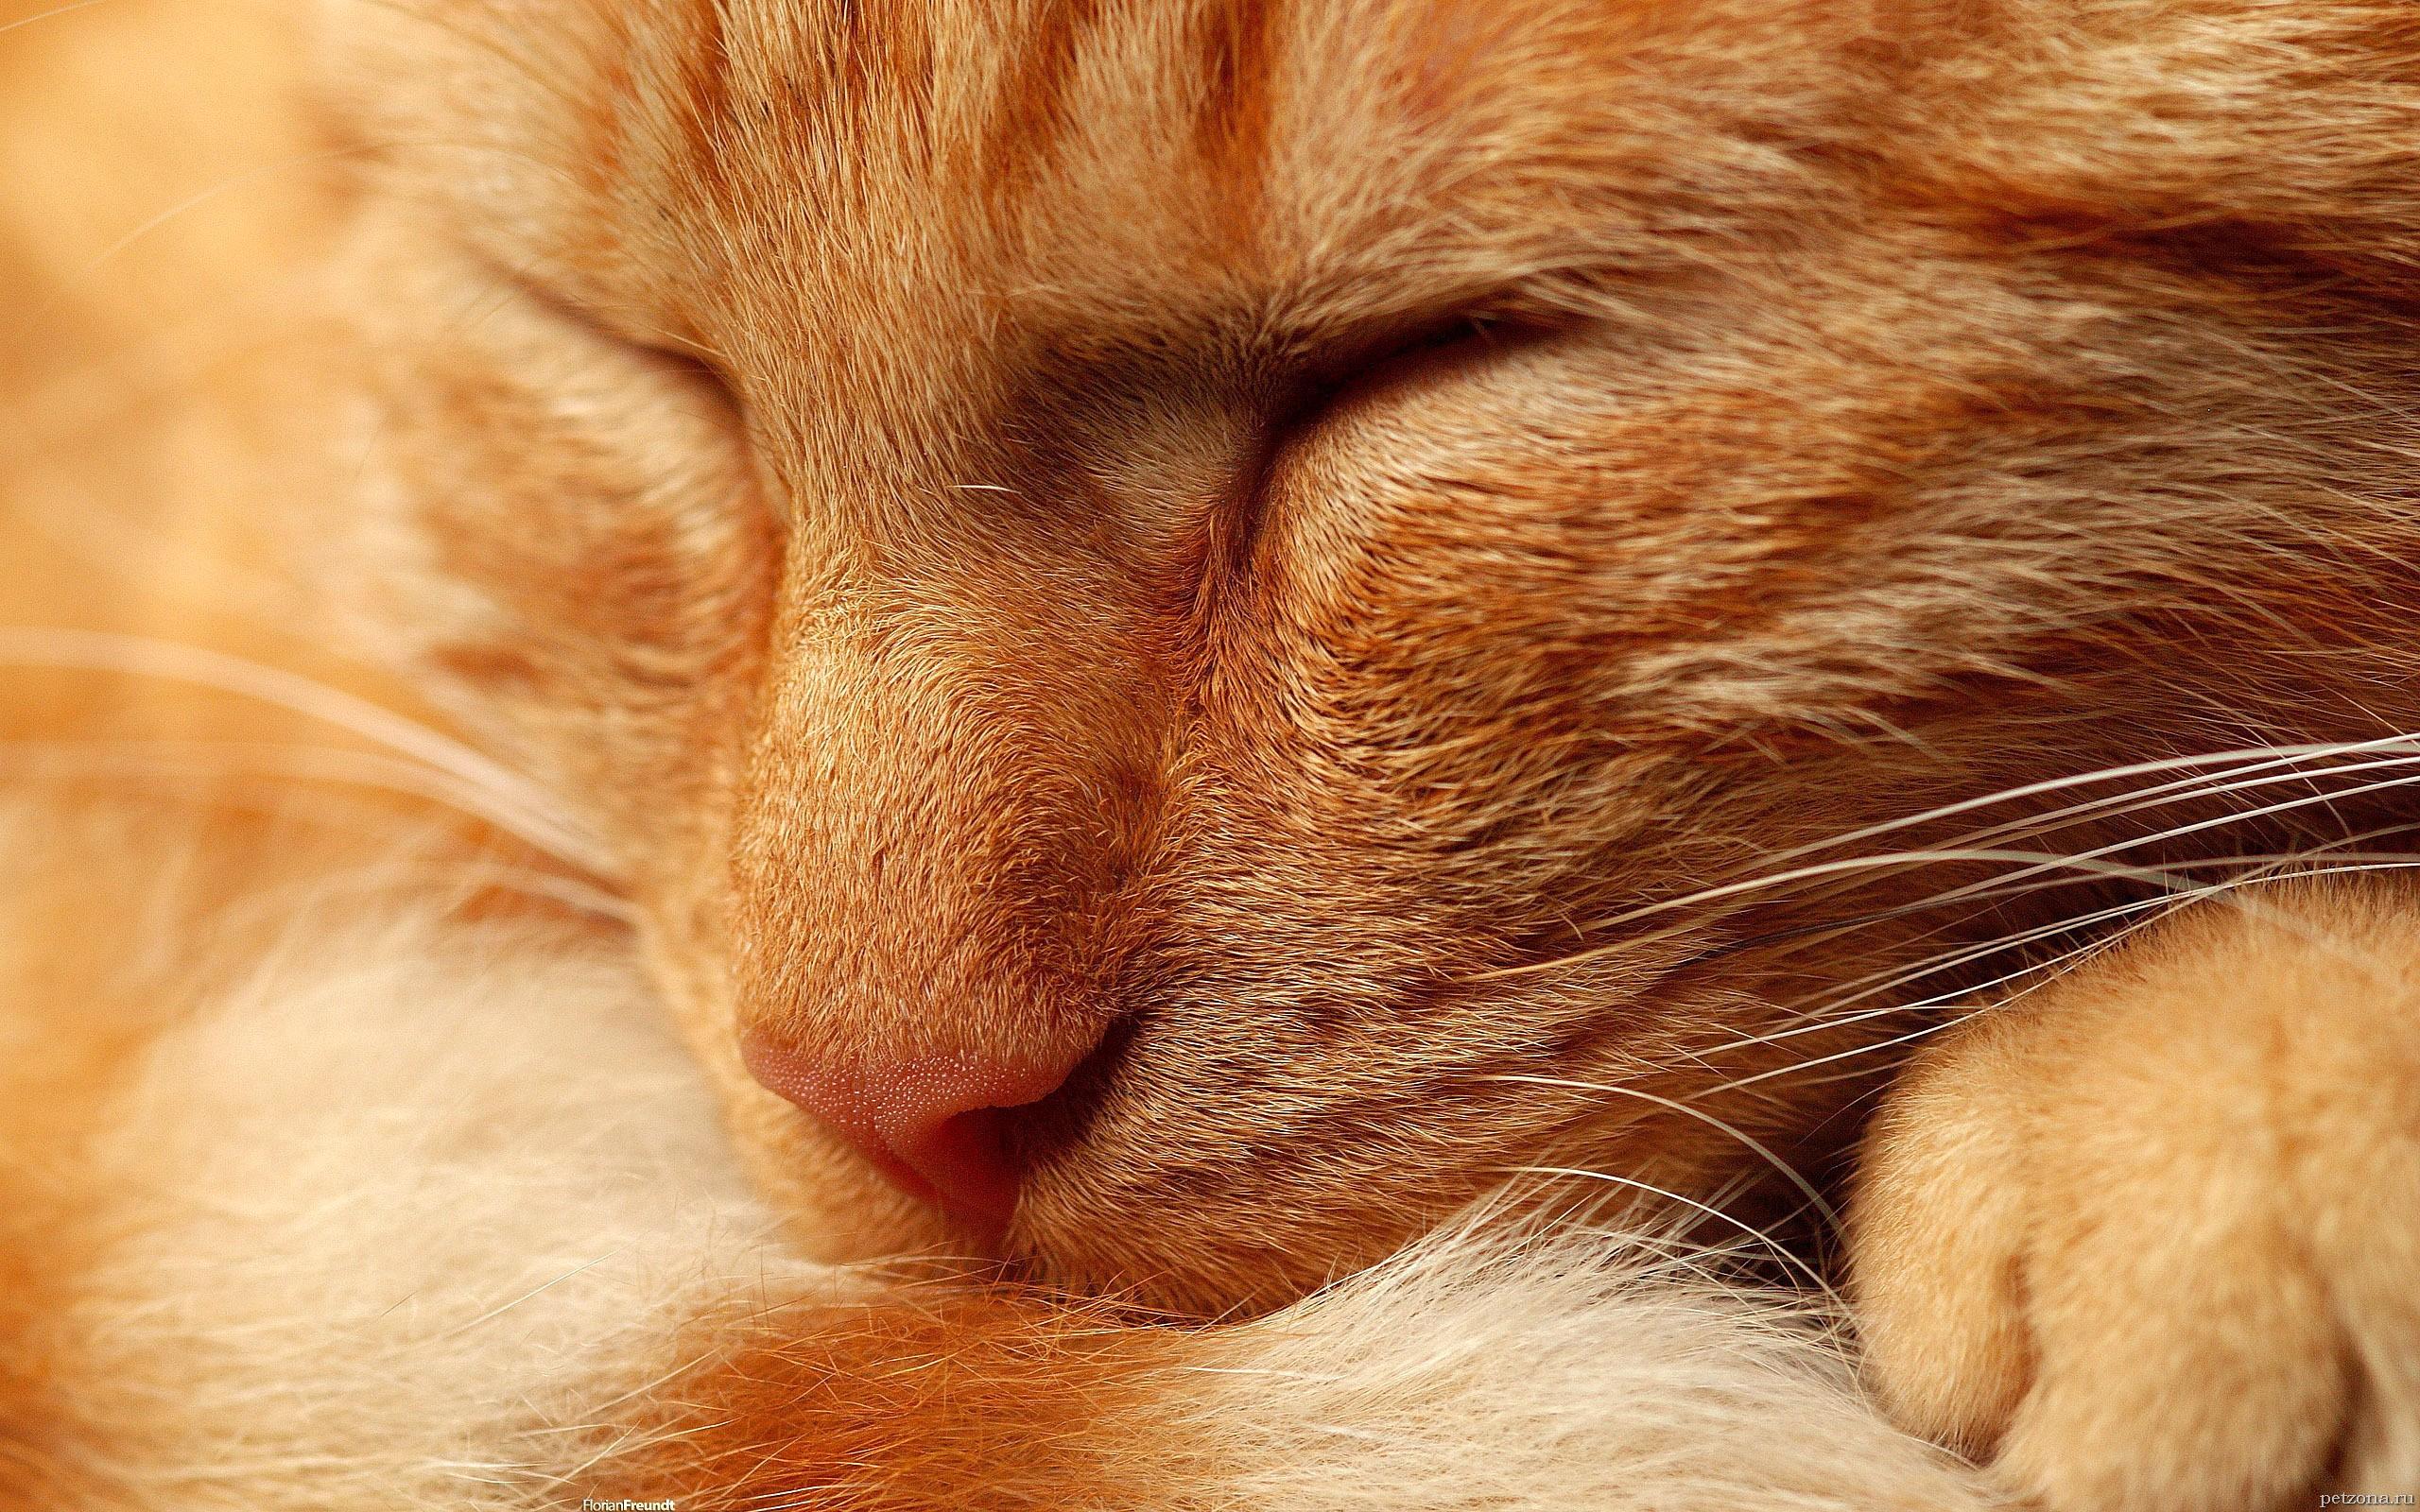 Дневник кота Плинтуса. Часть 4 (4.1)